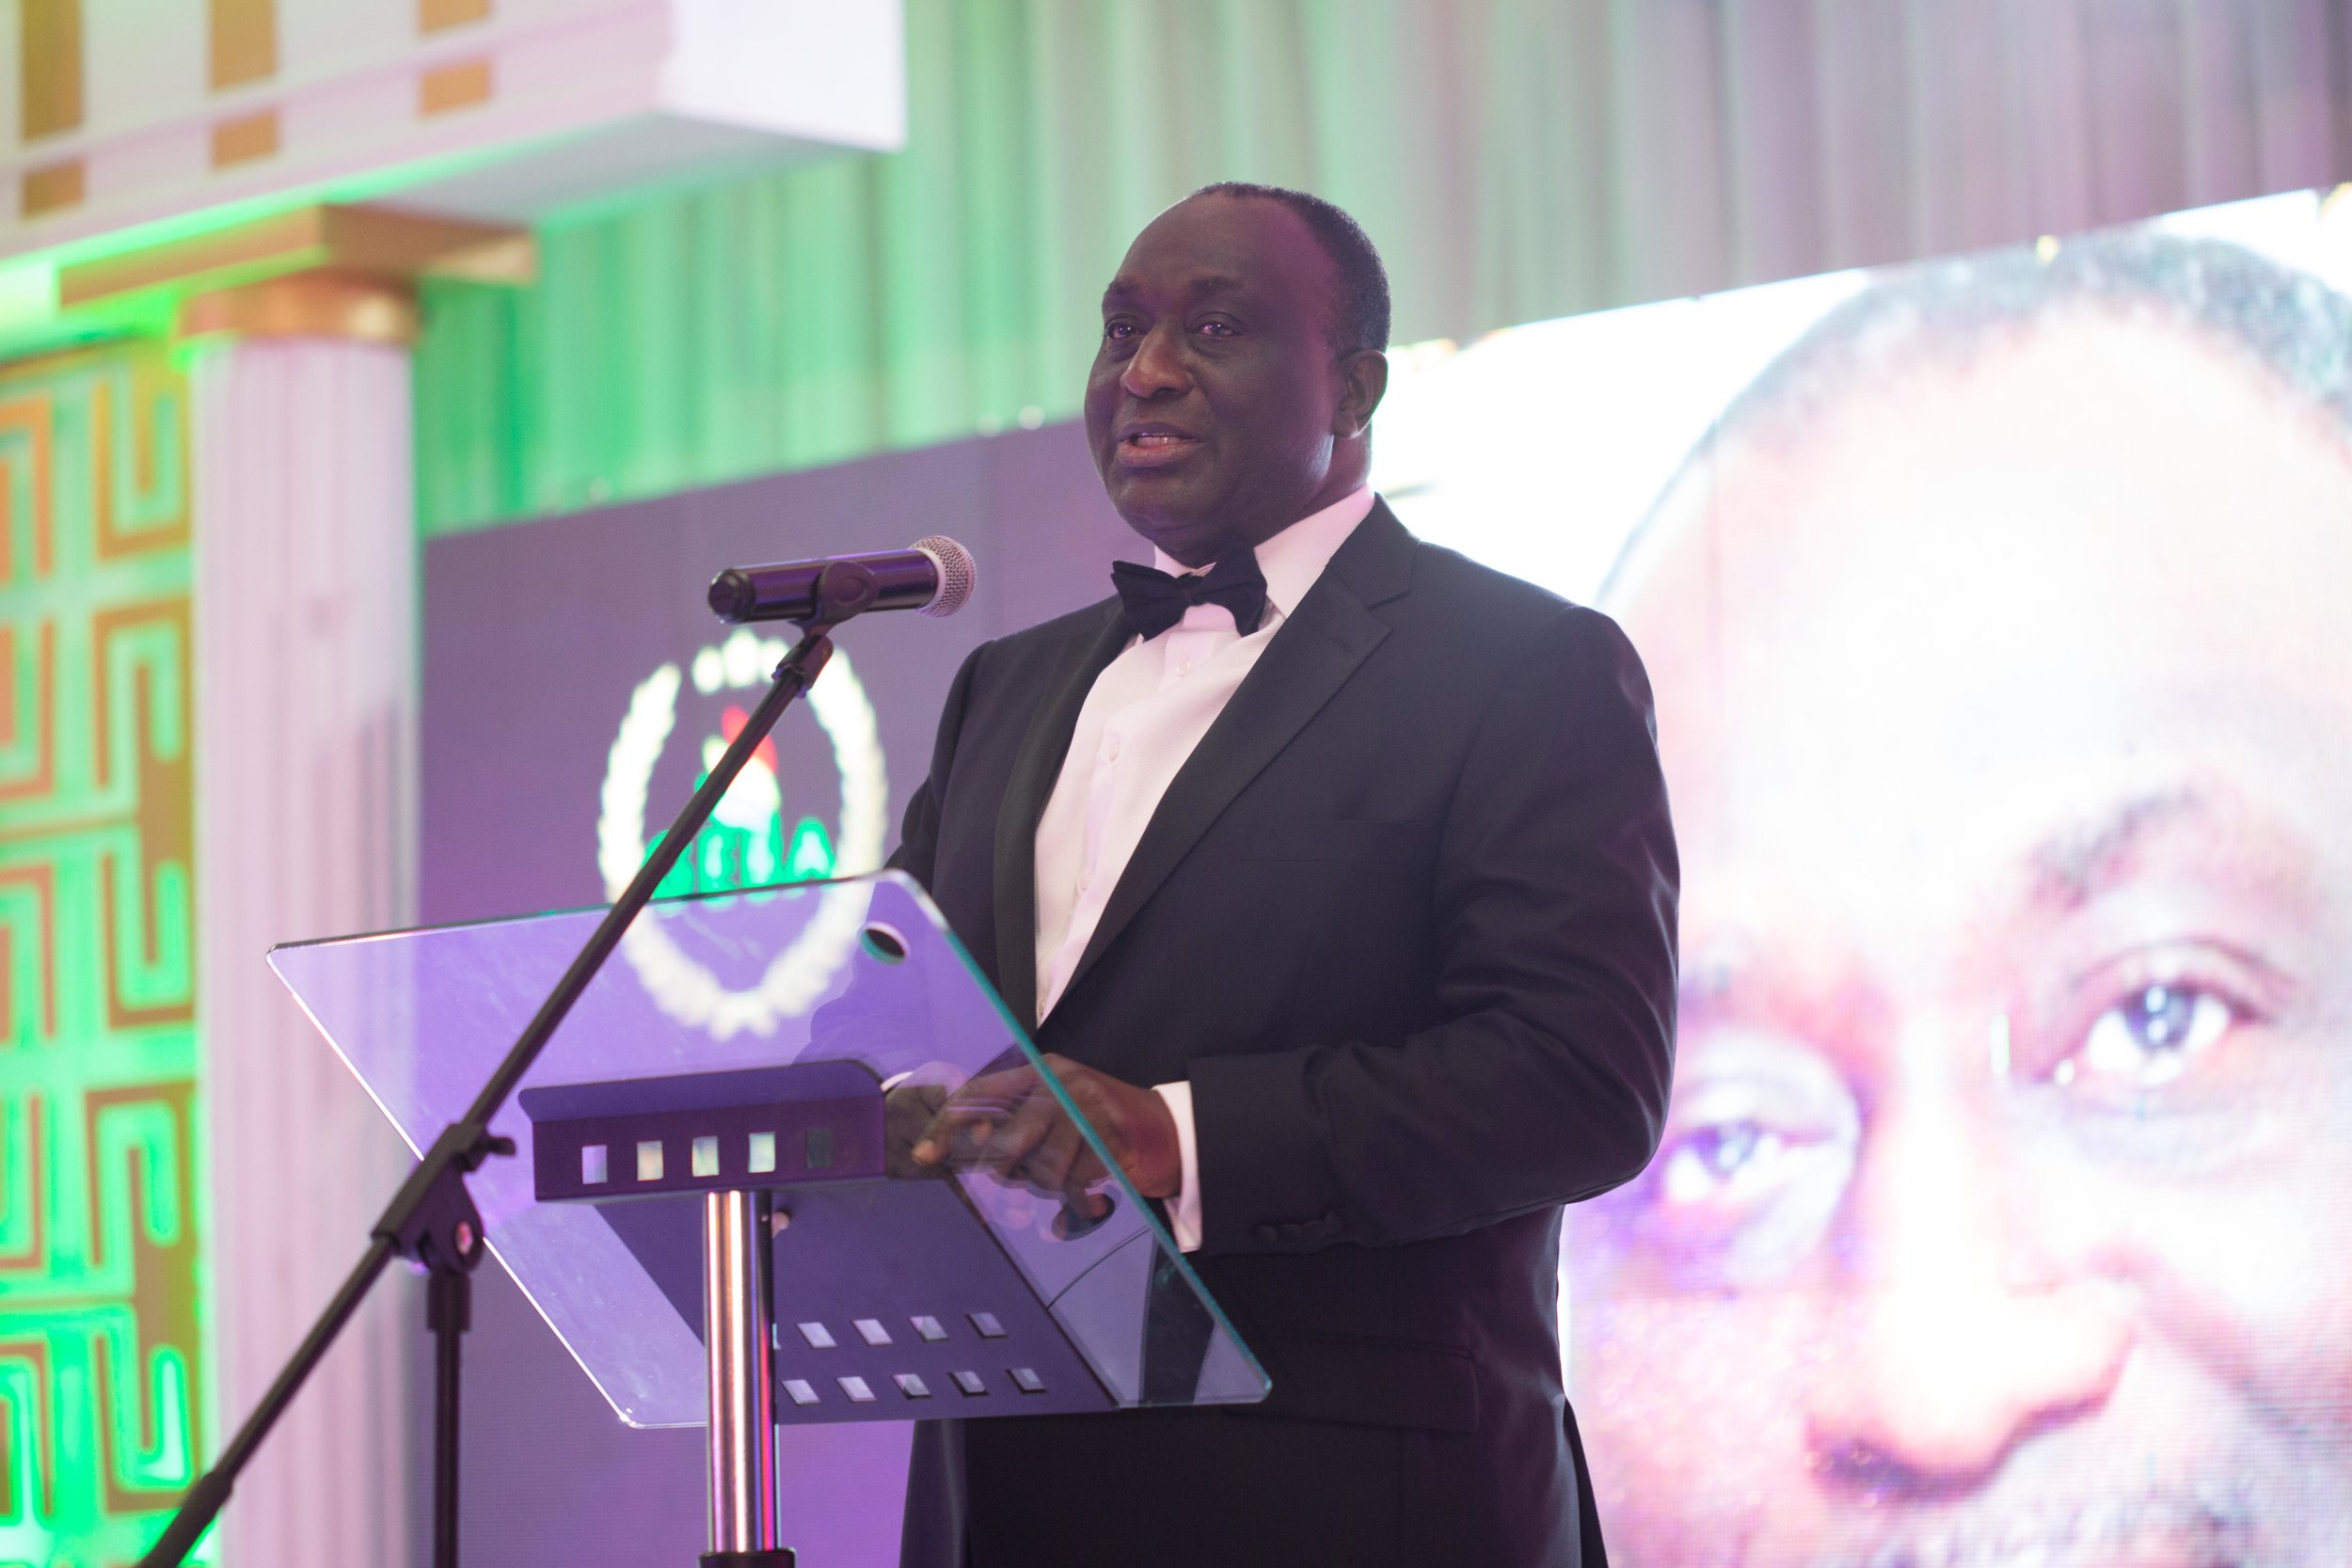 Hon. Alan Kyeremanteng delivering his speech at the awards